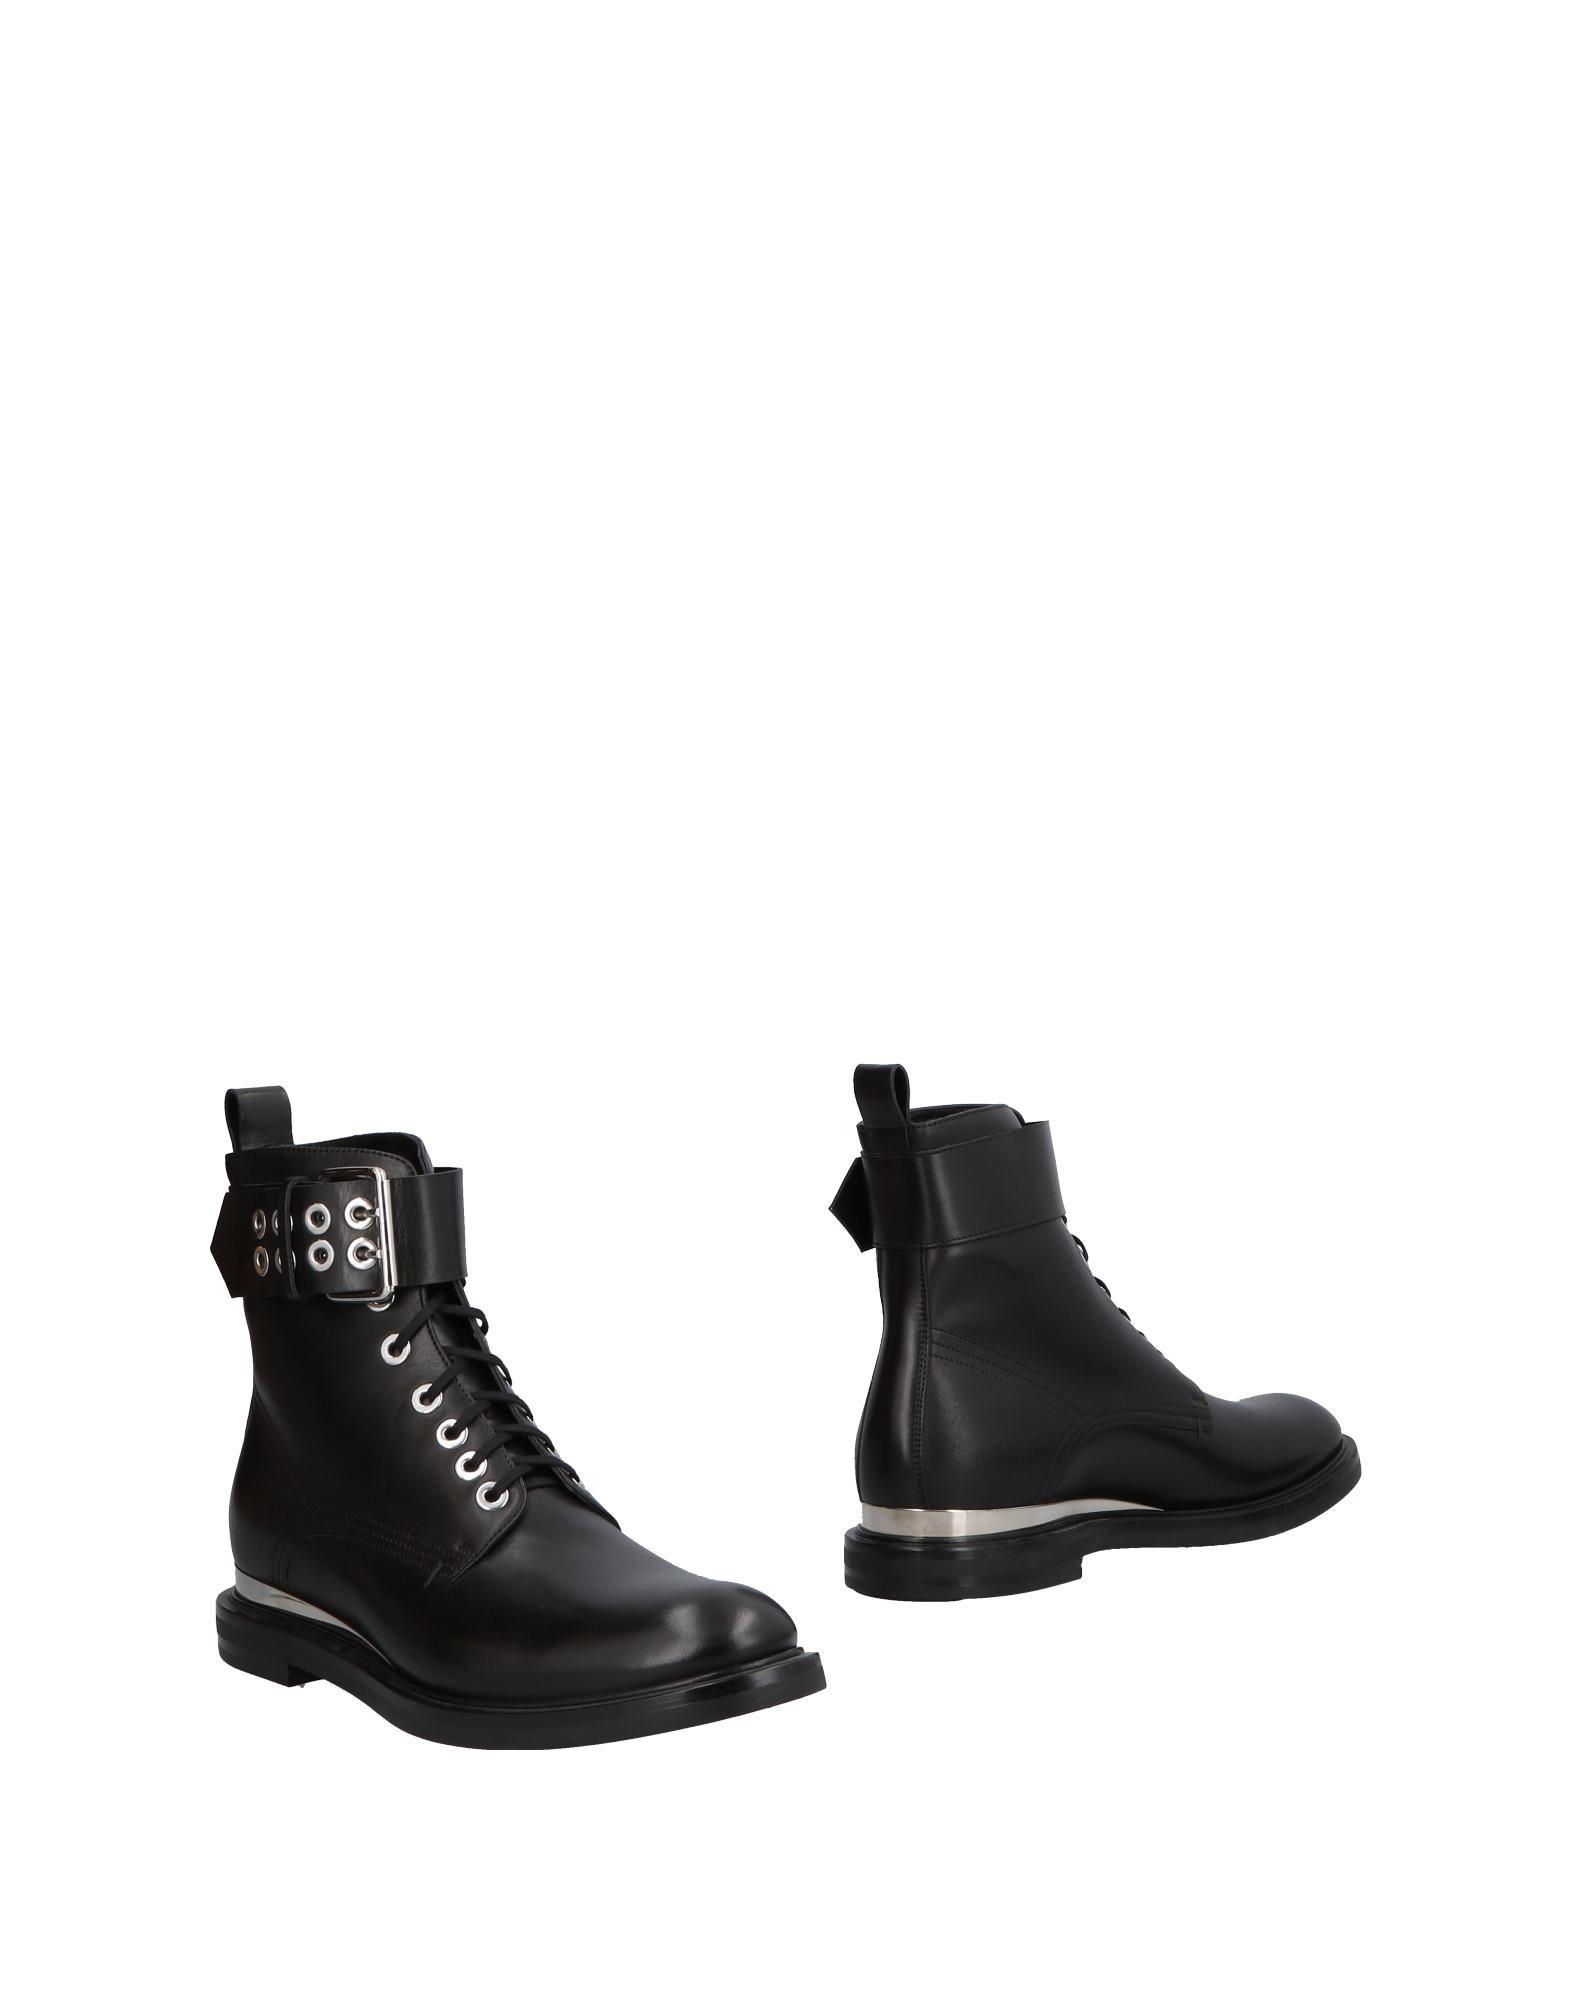 Cesare Casadei Stiefelette Qualität Herren  11500413UJ Gute Qualität Stiefelette beliebte Schuhe 7deae9